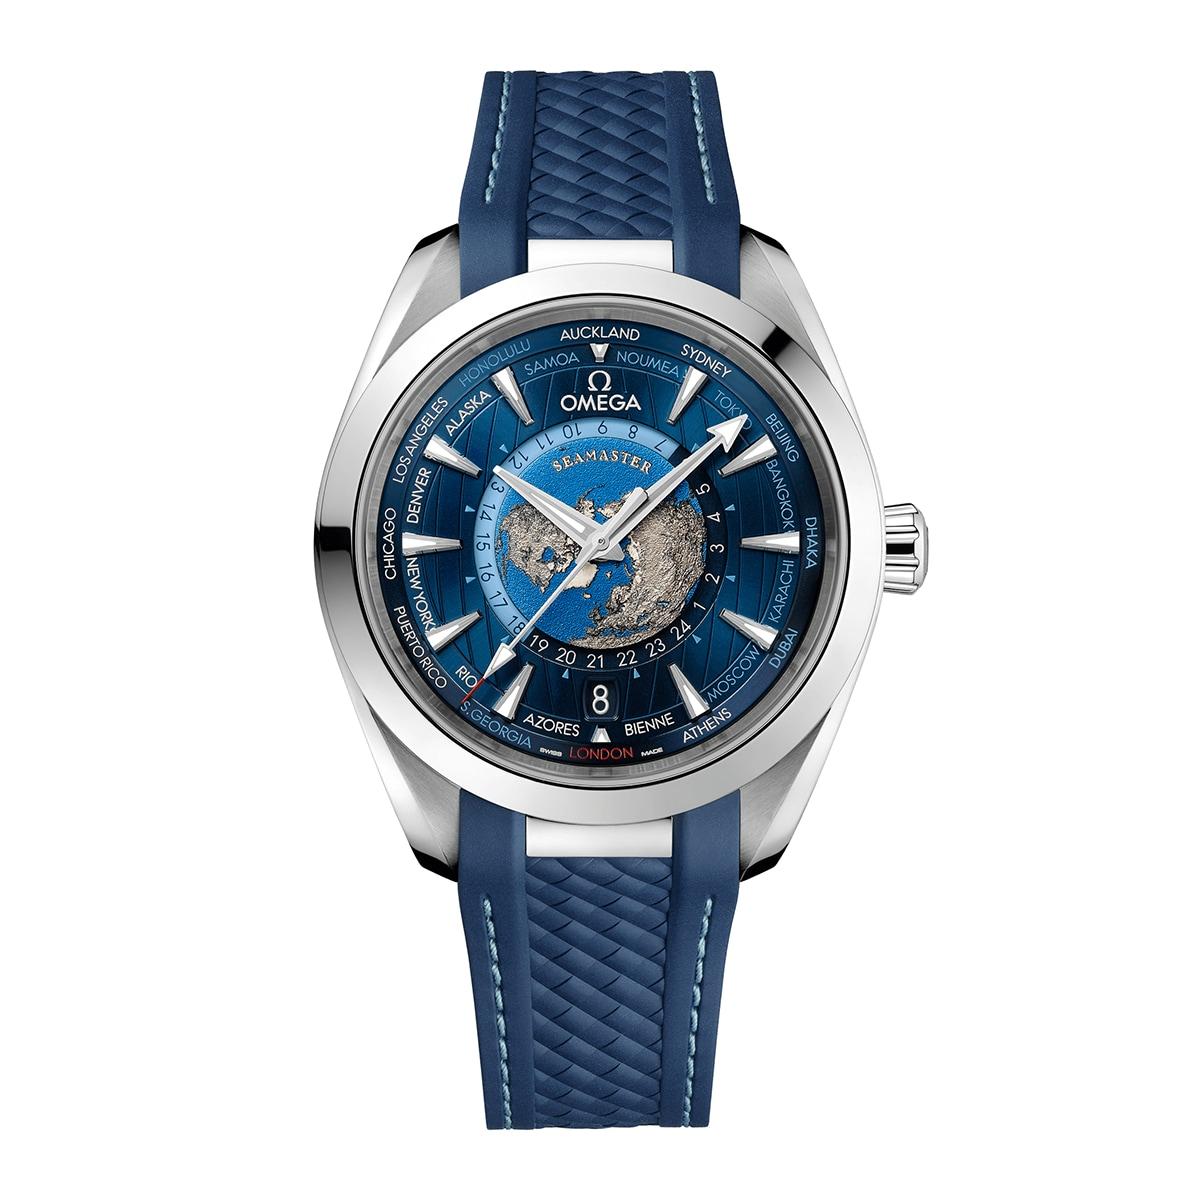 Seamaster Aqua Terra GMT Worldtimer